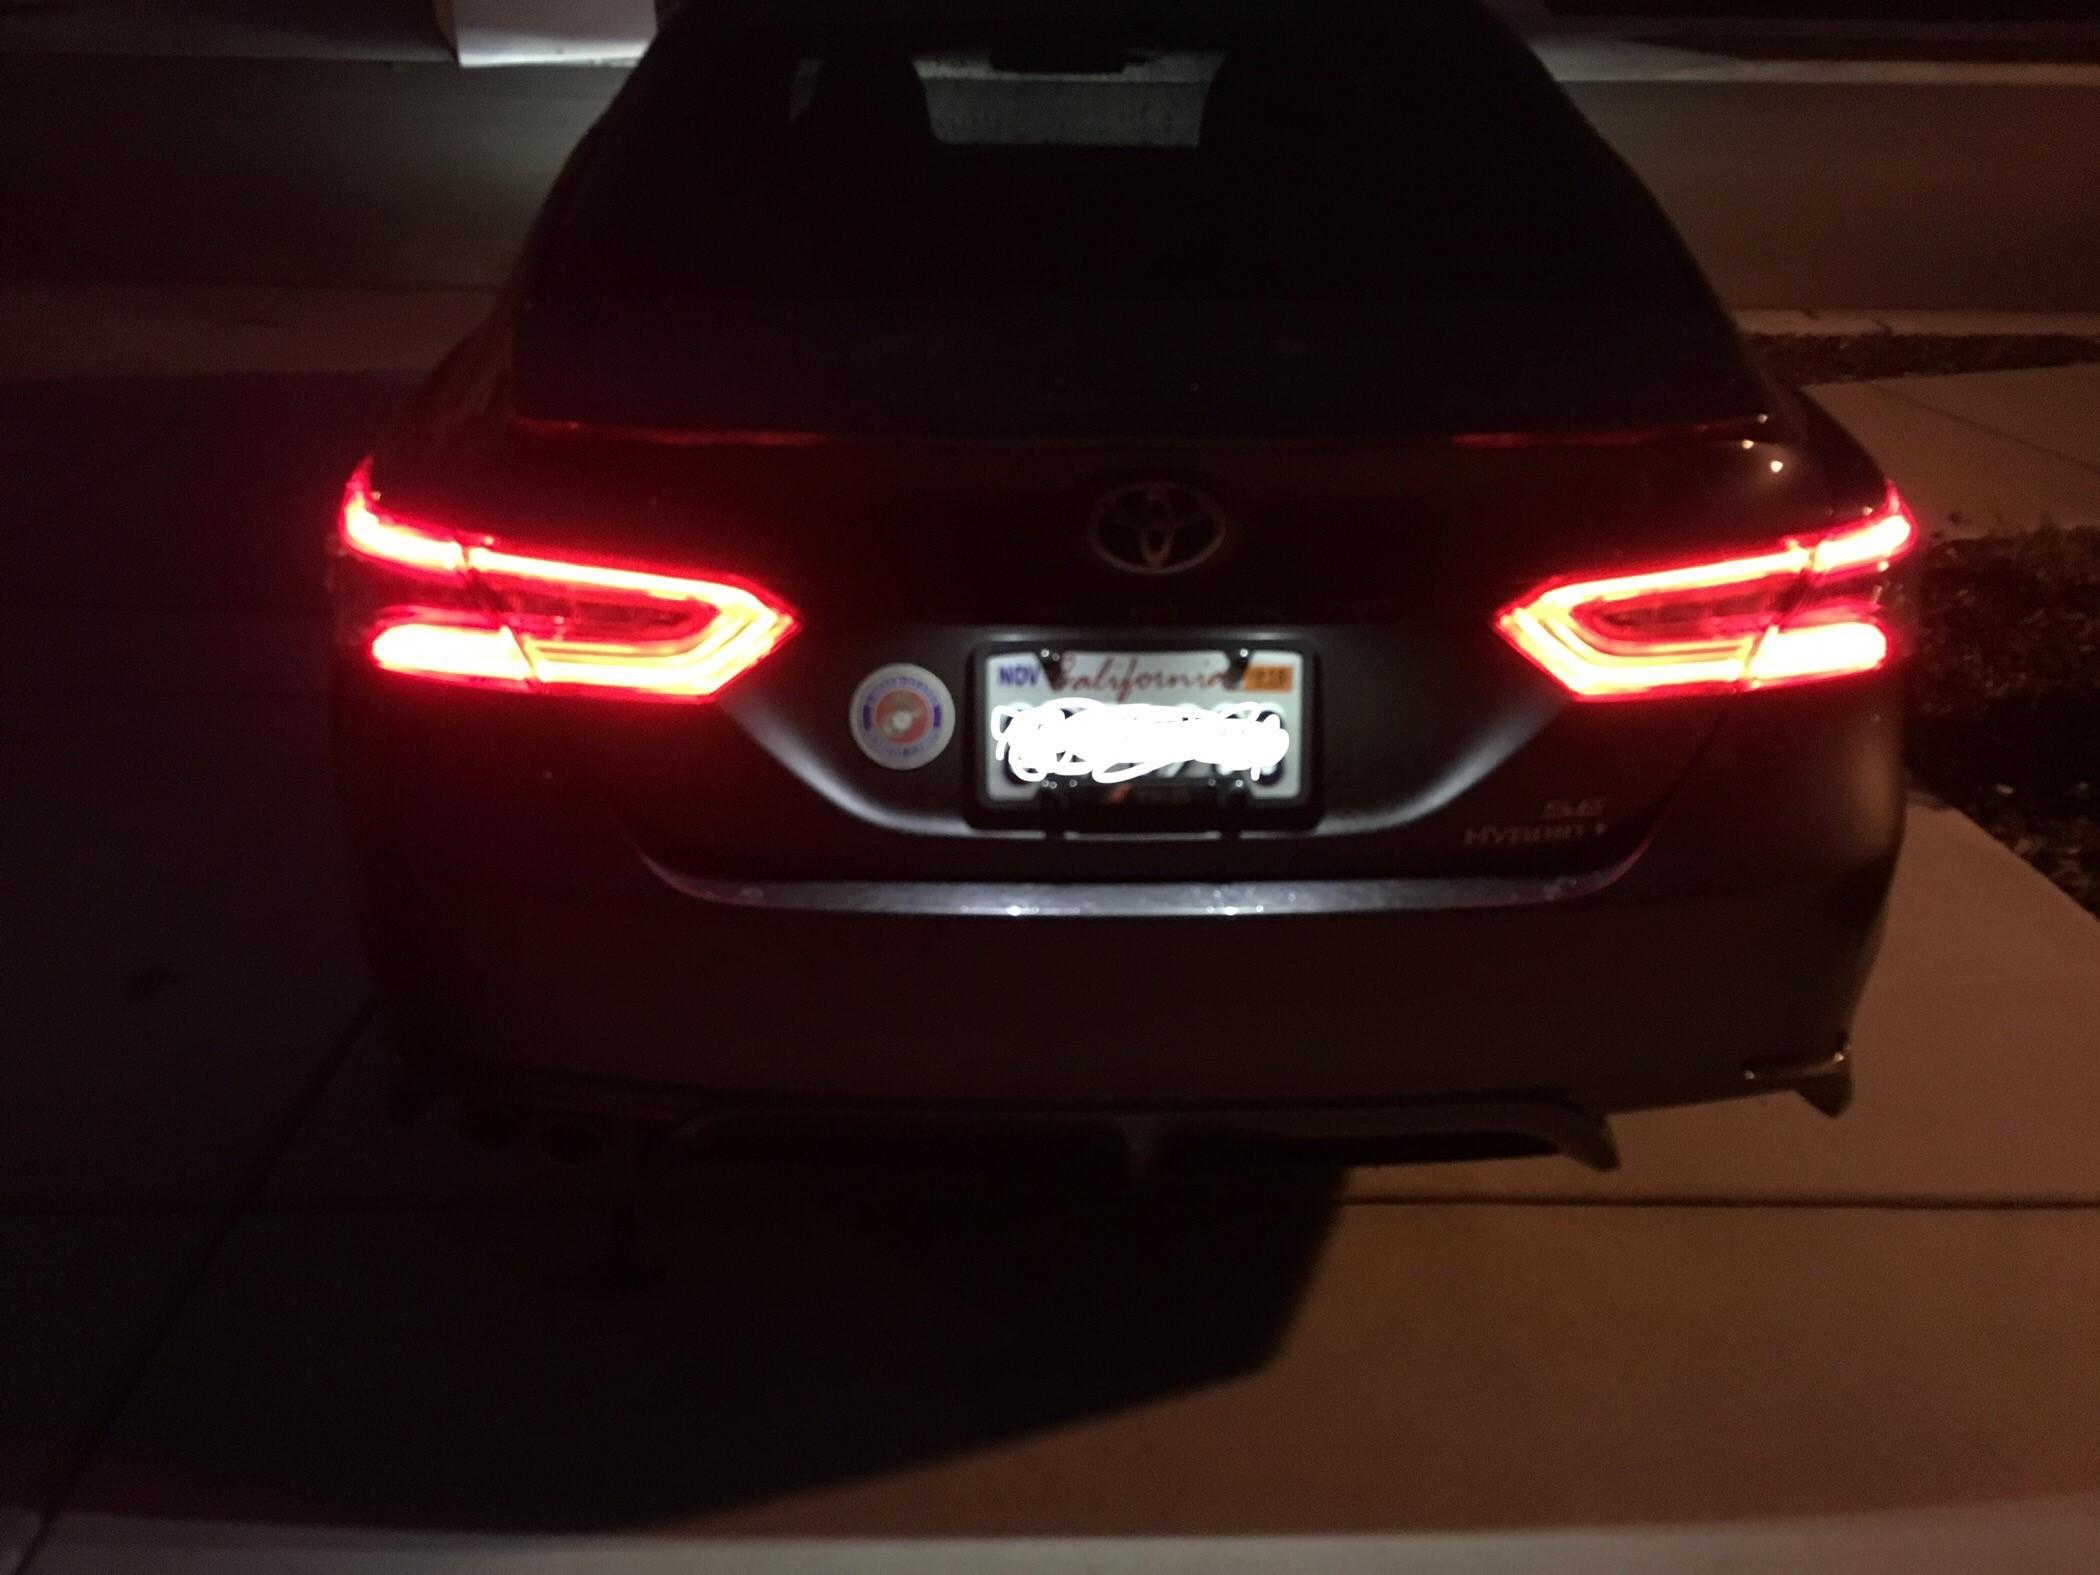 LED Daytime Lights//Turn Signal Kit For 18-up Toyota Camry L LE SE Hybrid SE TRD